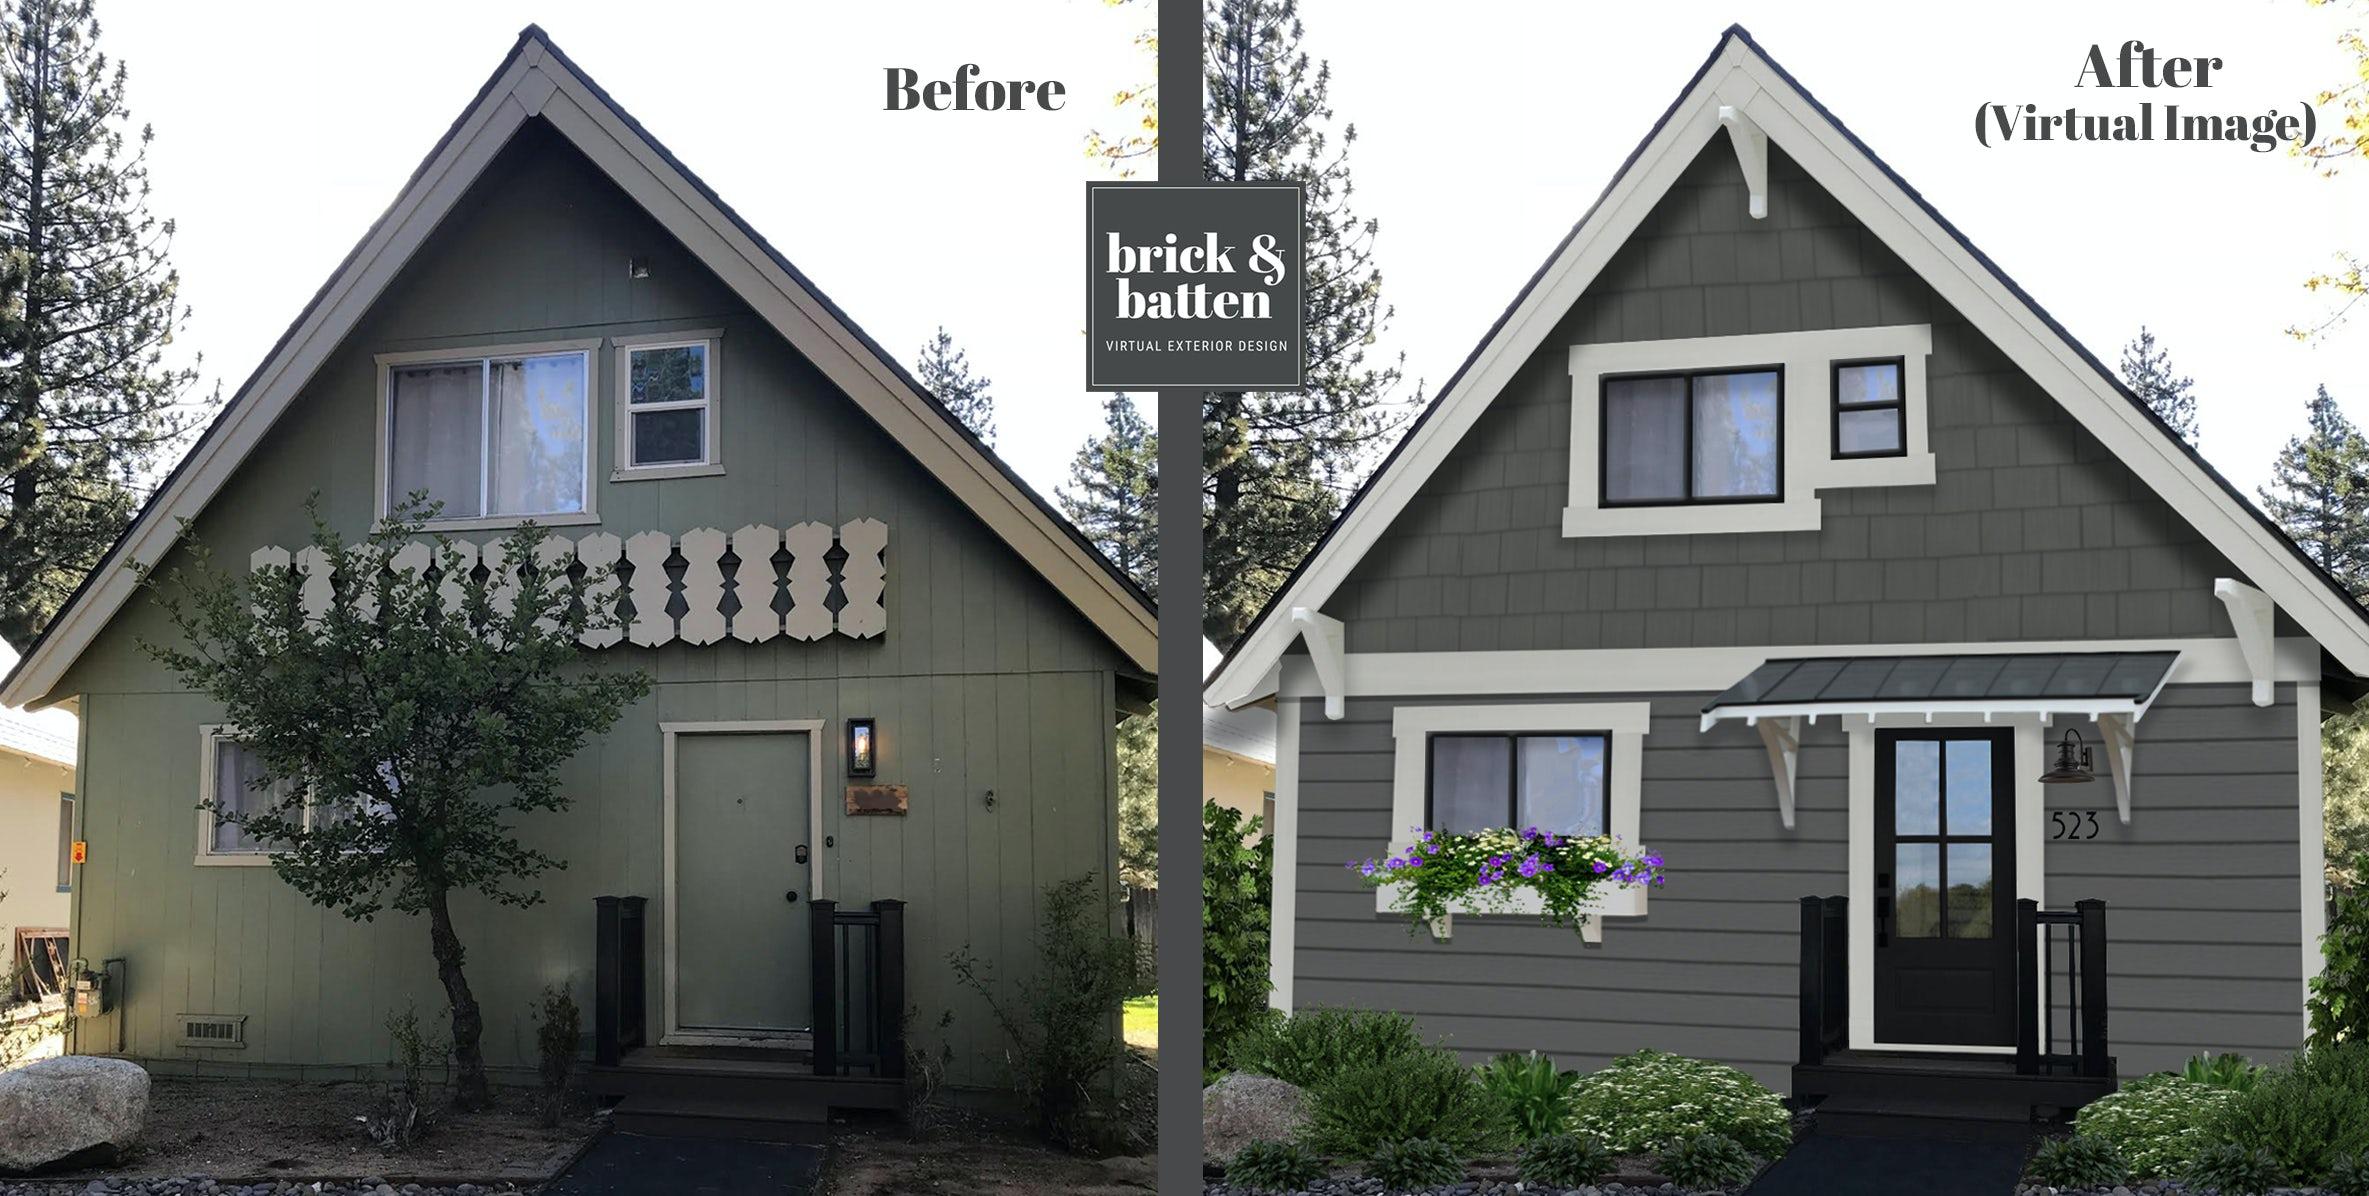 12 Tips For Home Exterior Design In 2019 Blog Brick Batten